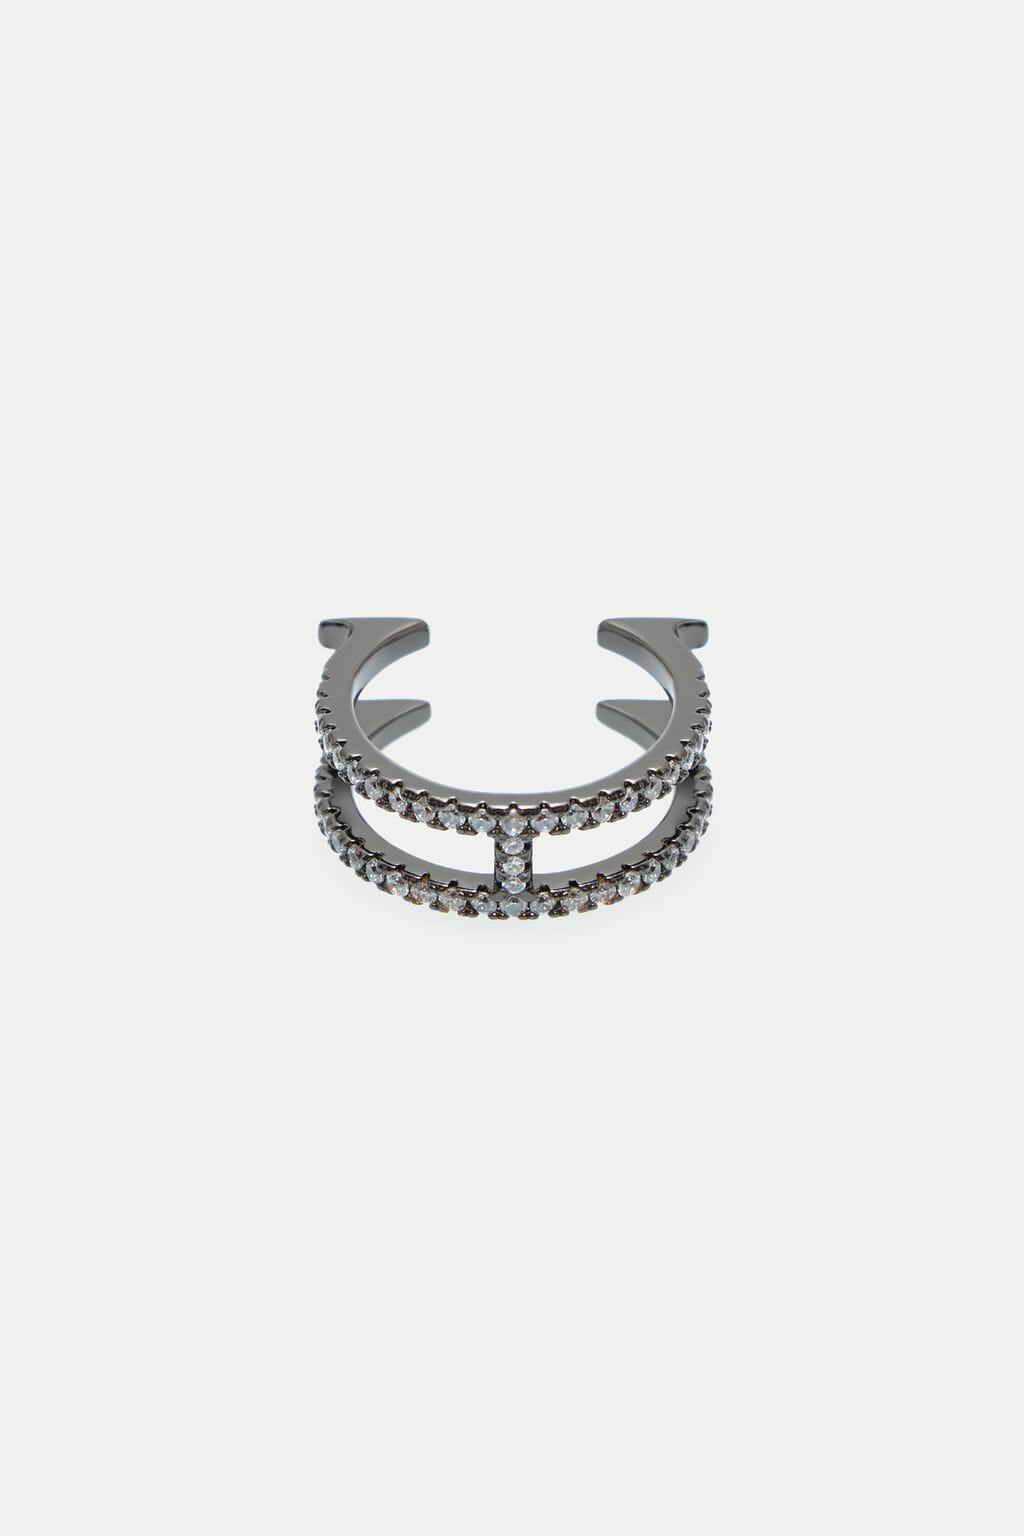 CH-Carolina-herrera-insignia-jewelry-look-29